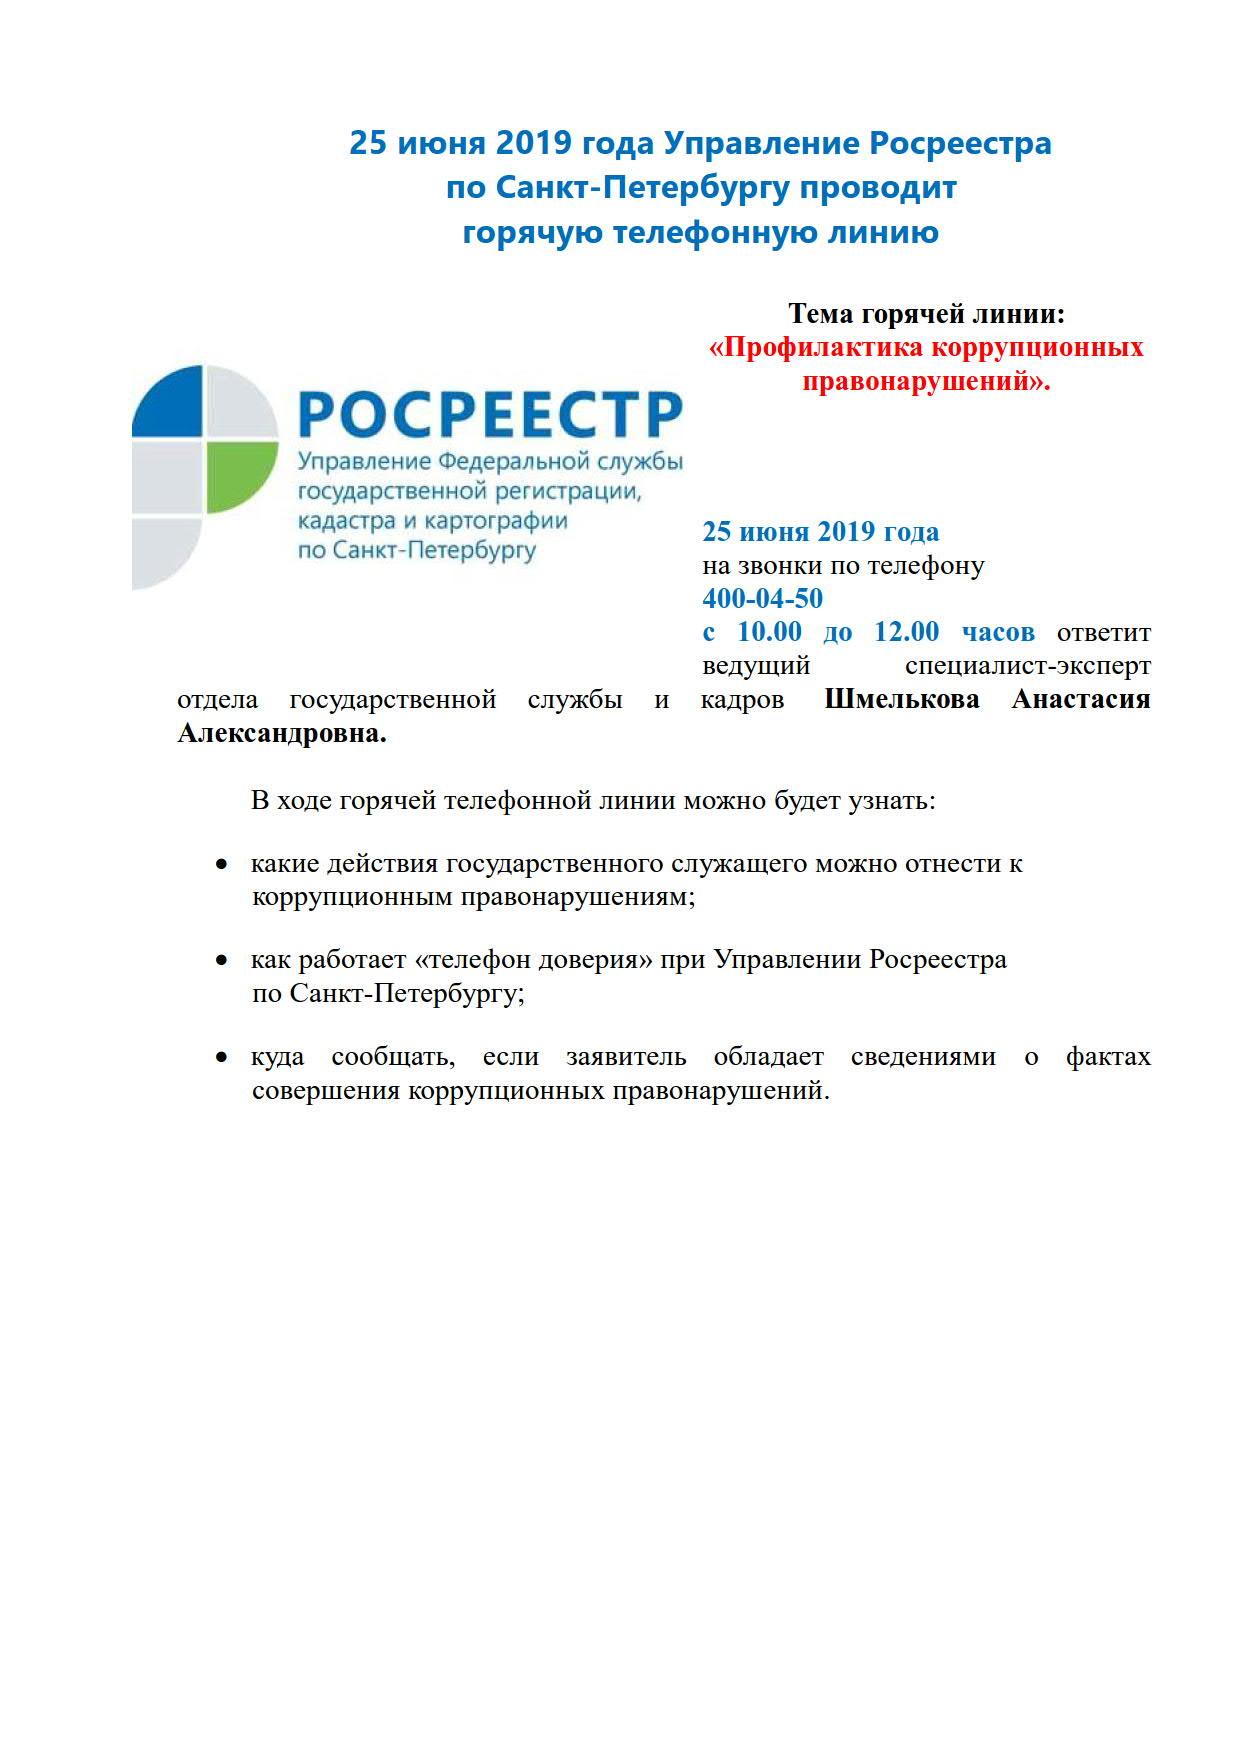 8_анонс 25.06.2019_ОГСК_1